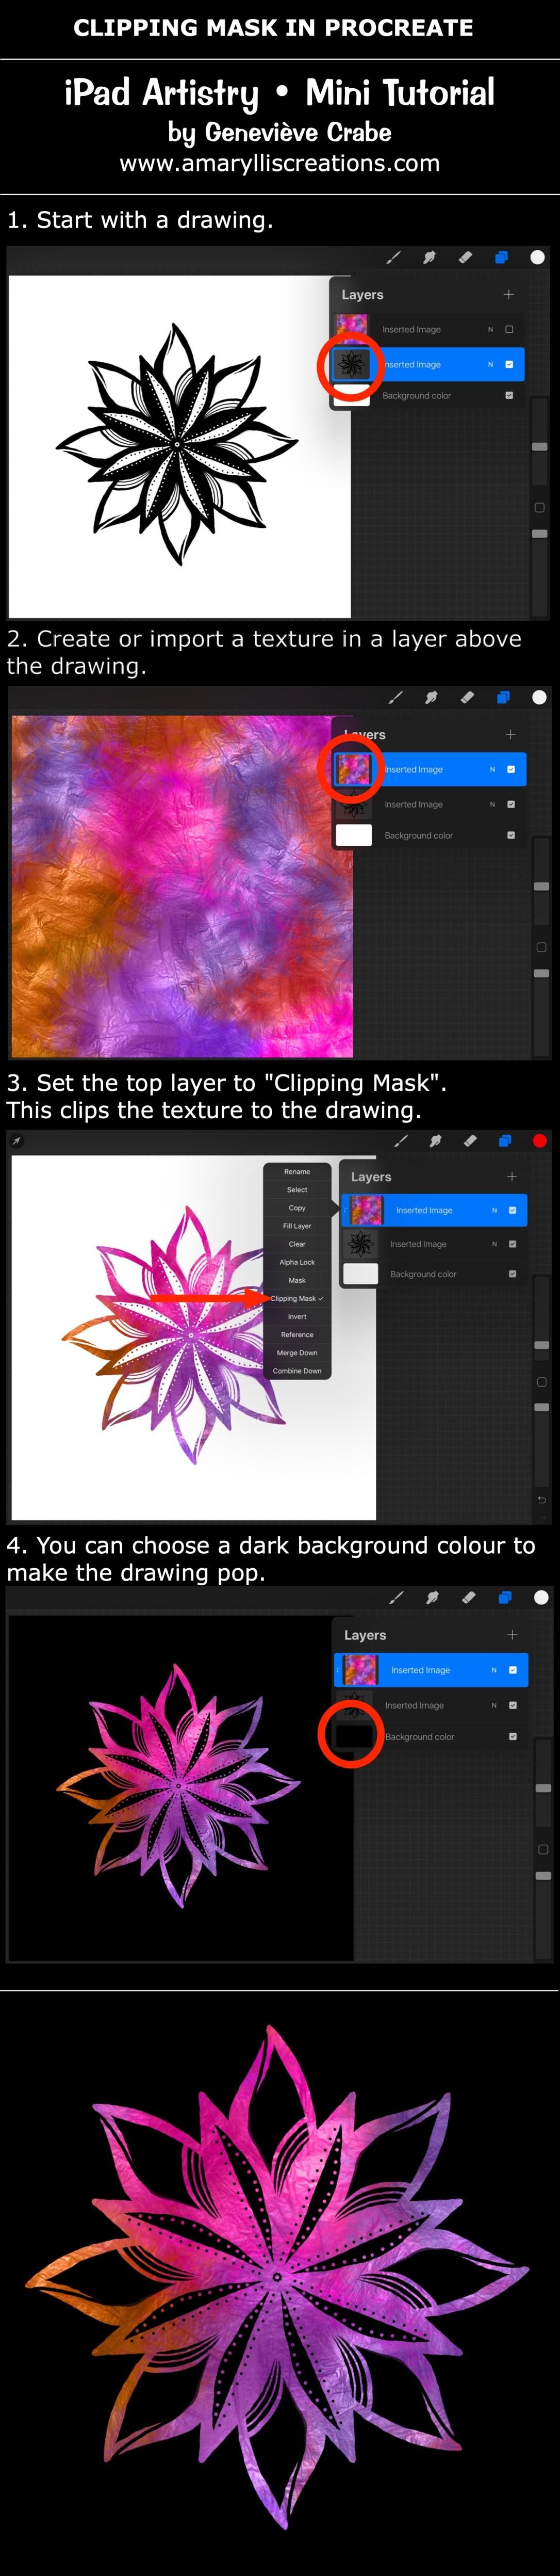 Mini tutorial: Clipping Mask in Procreate on iPad